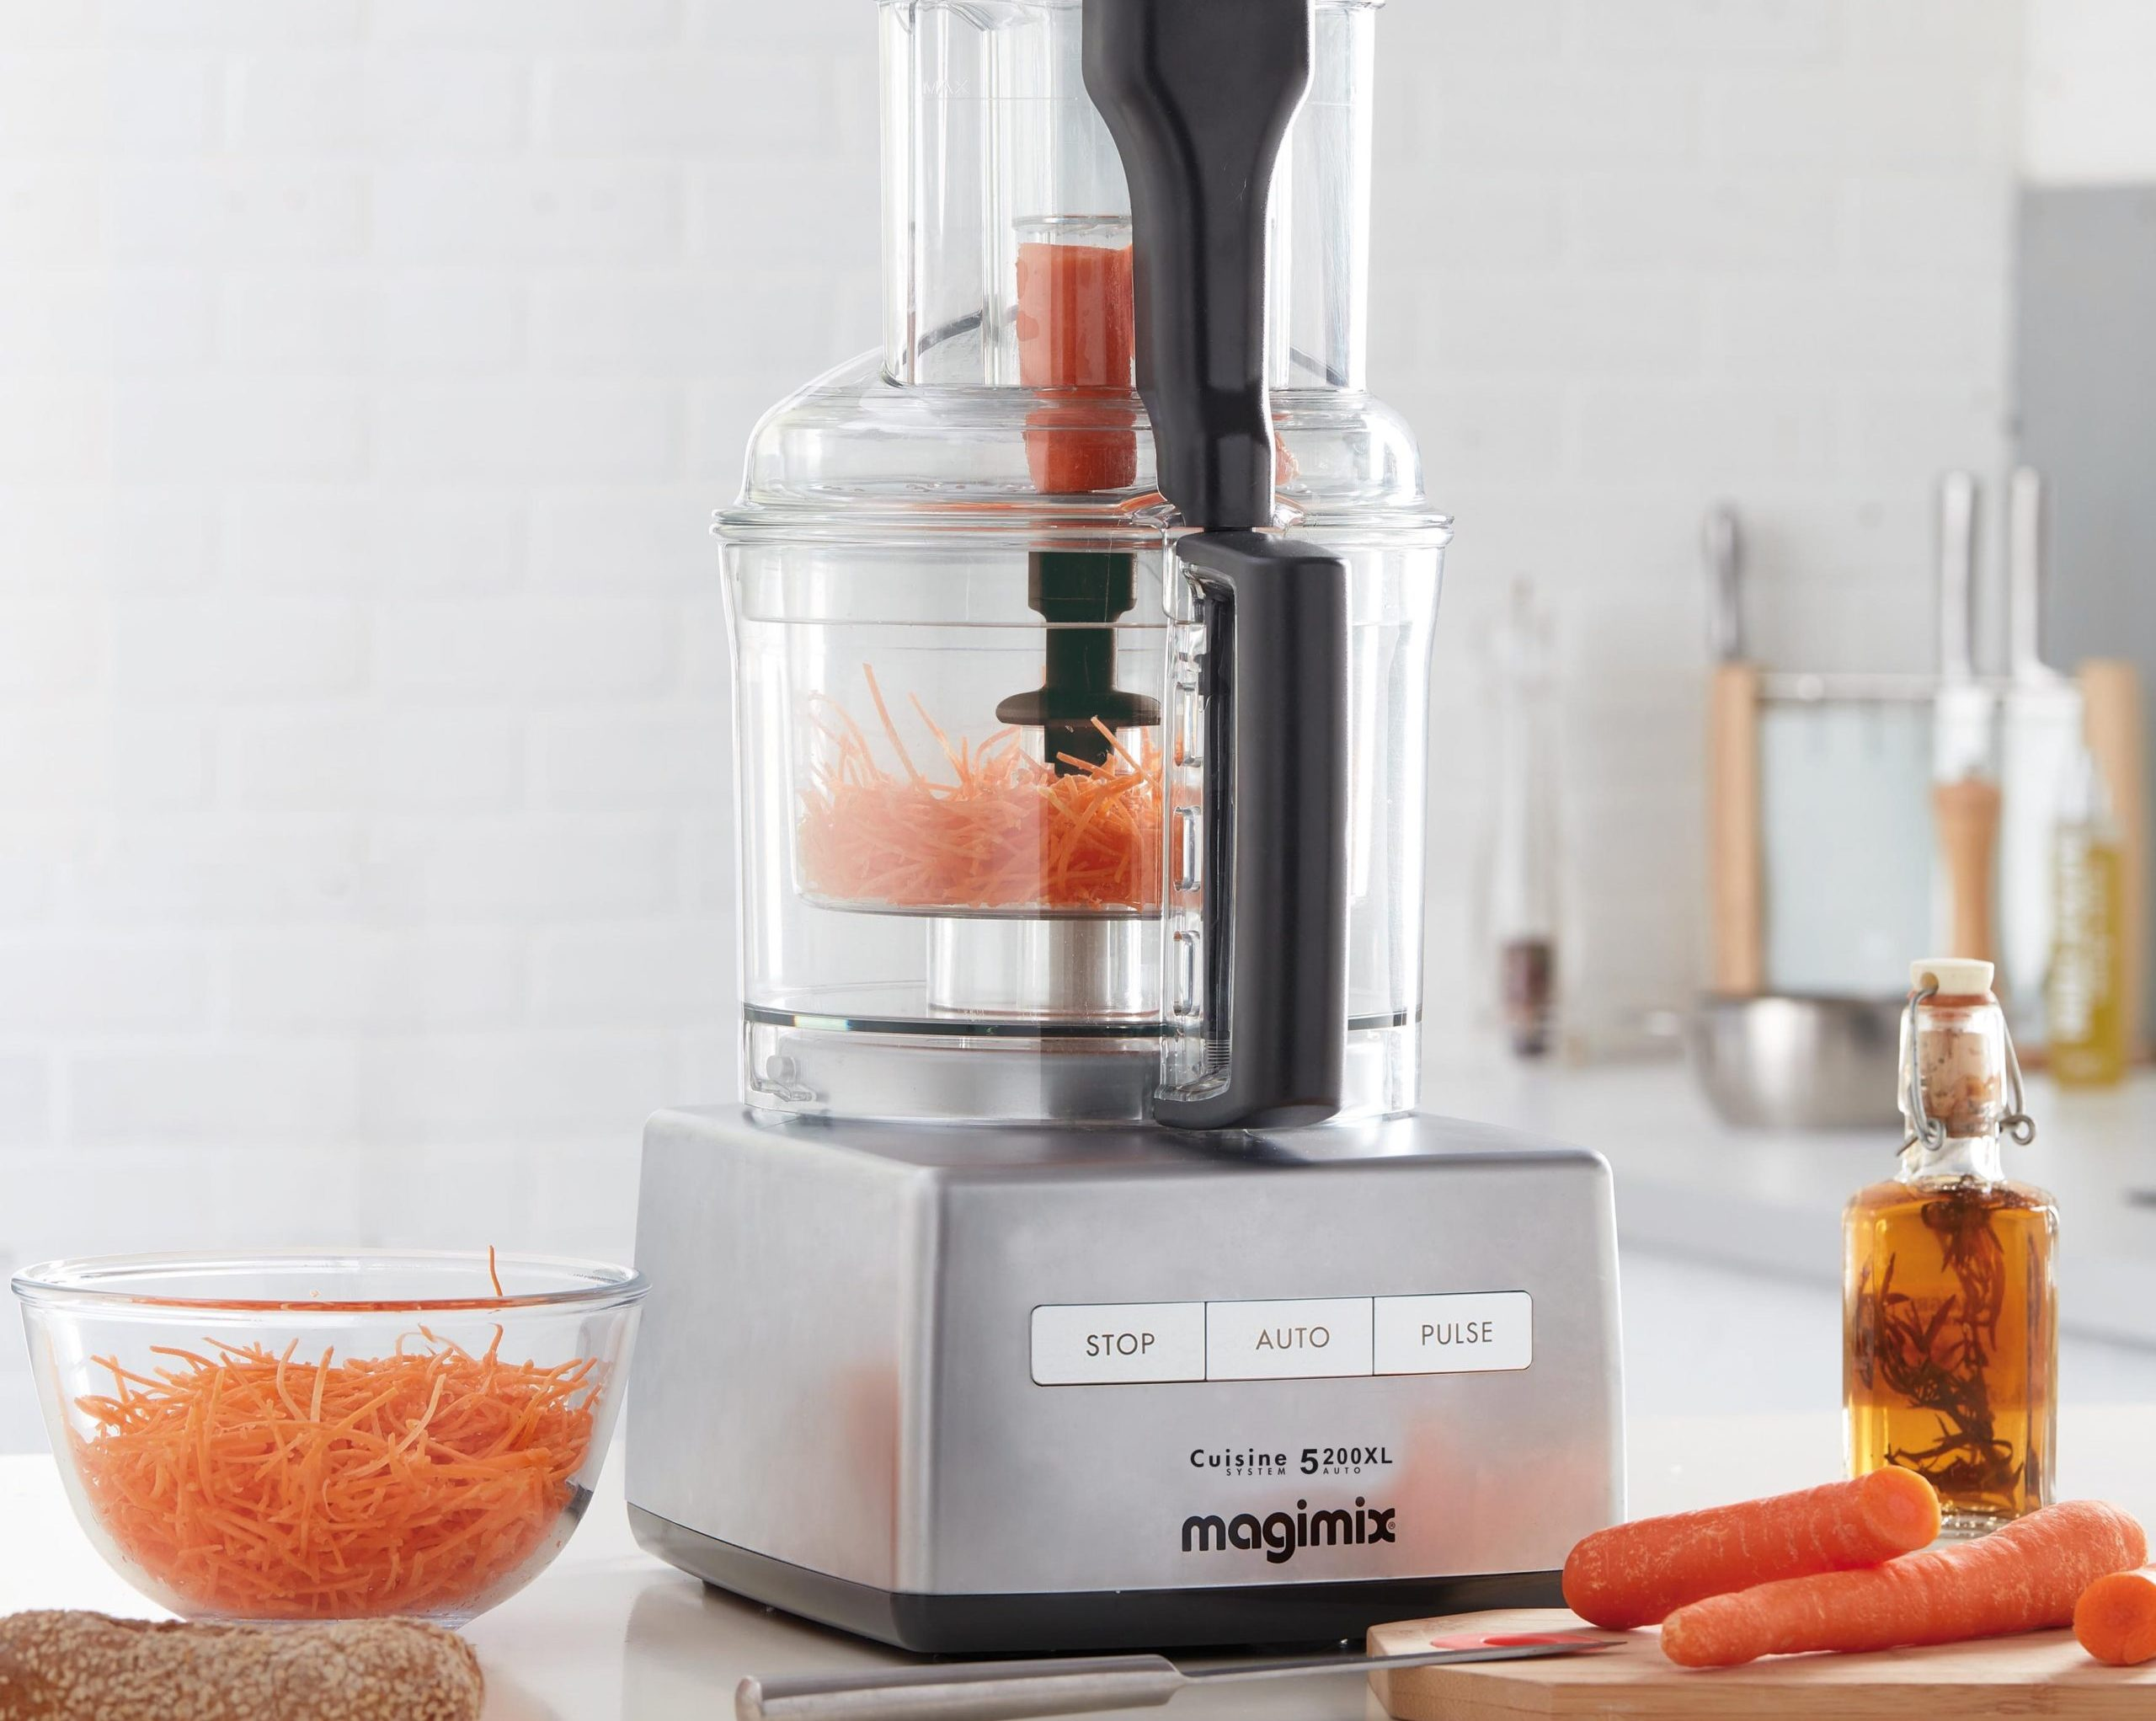 magimix robot da cucina cs 5200xl